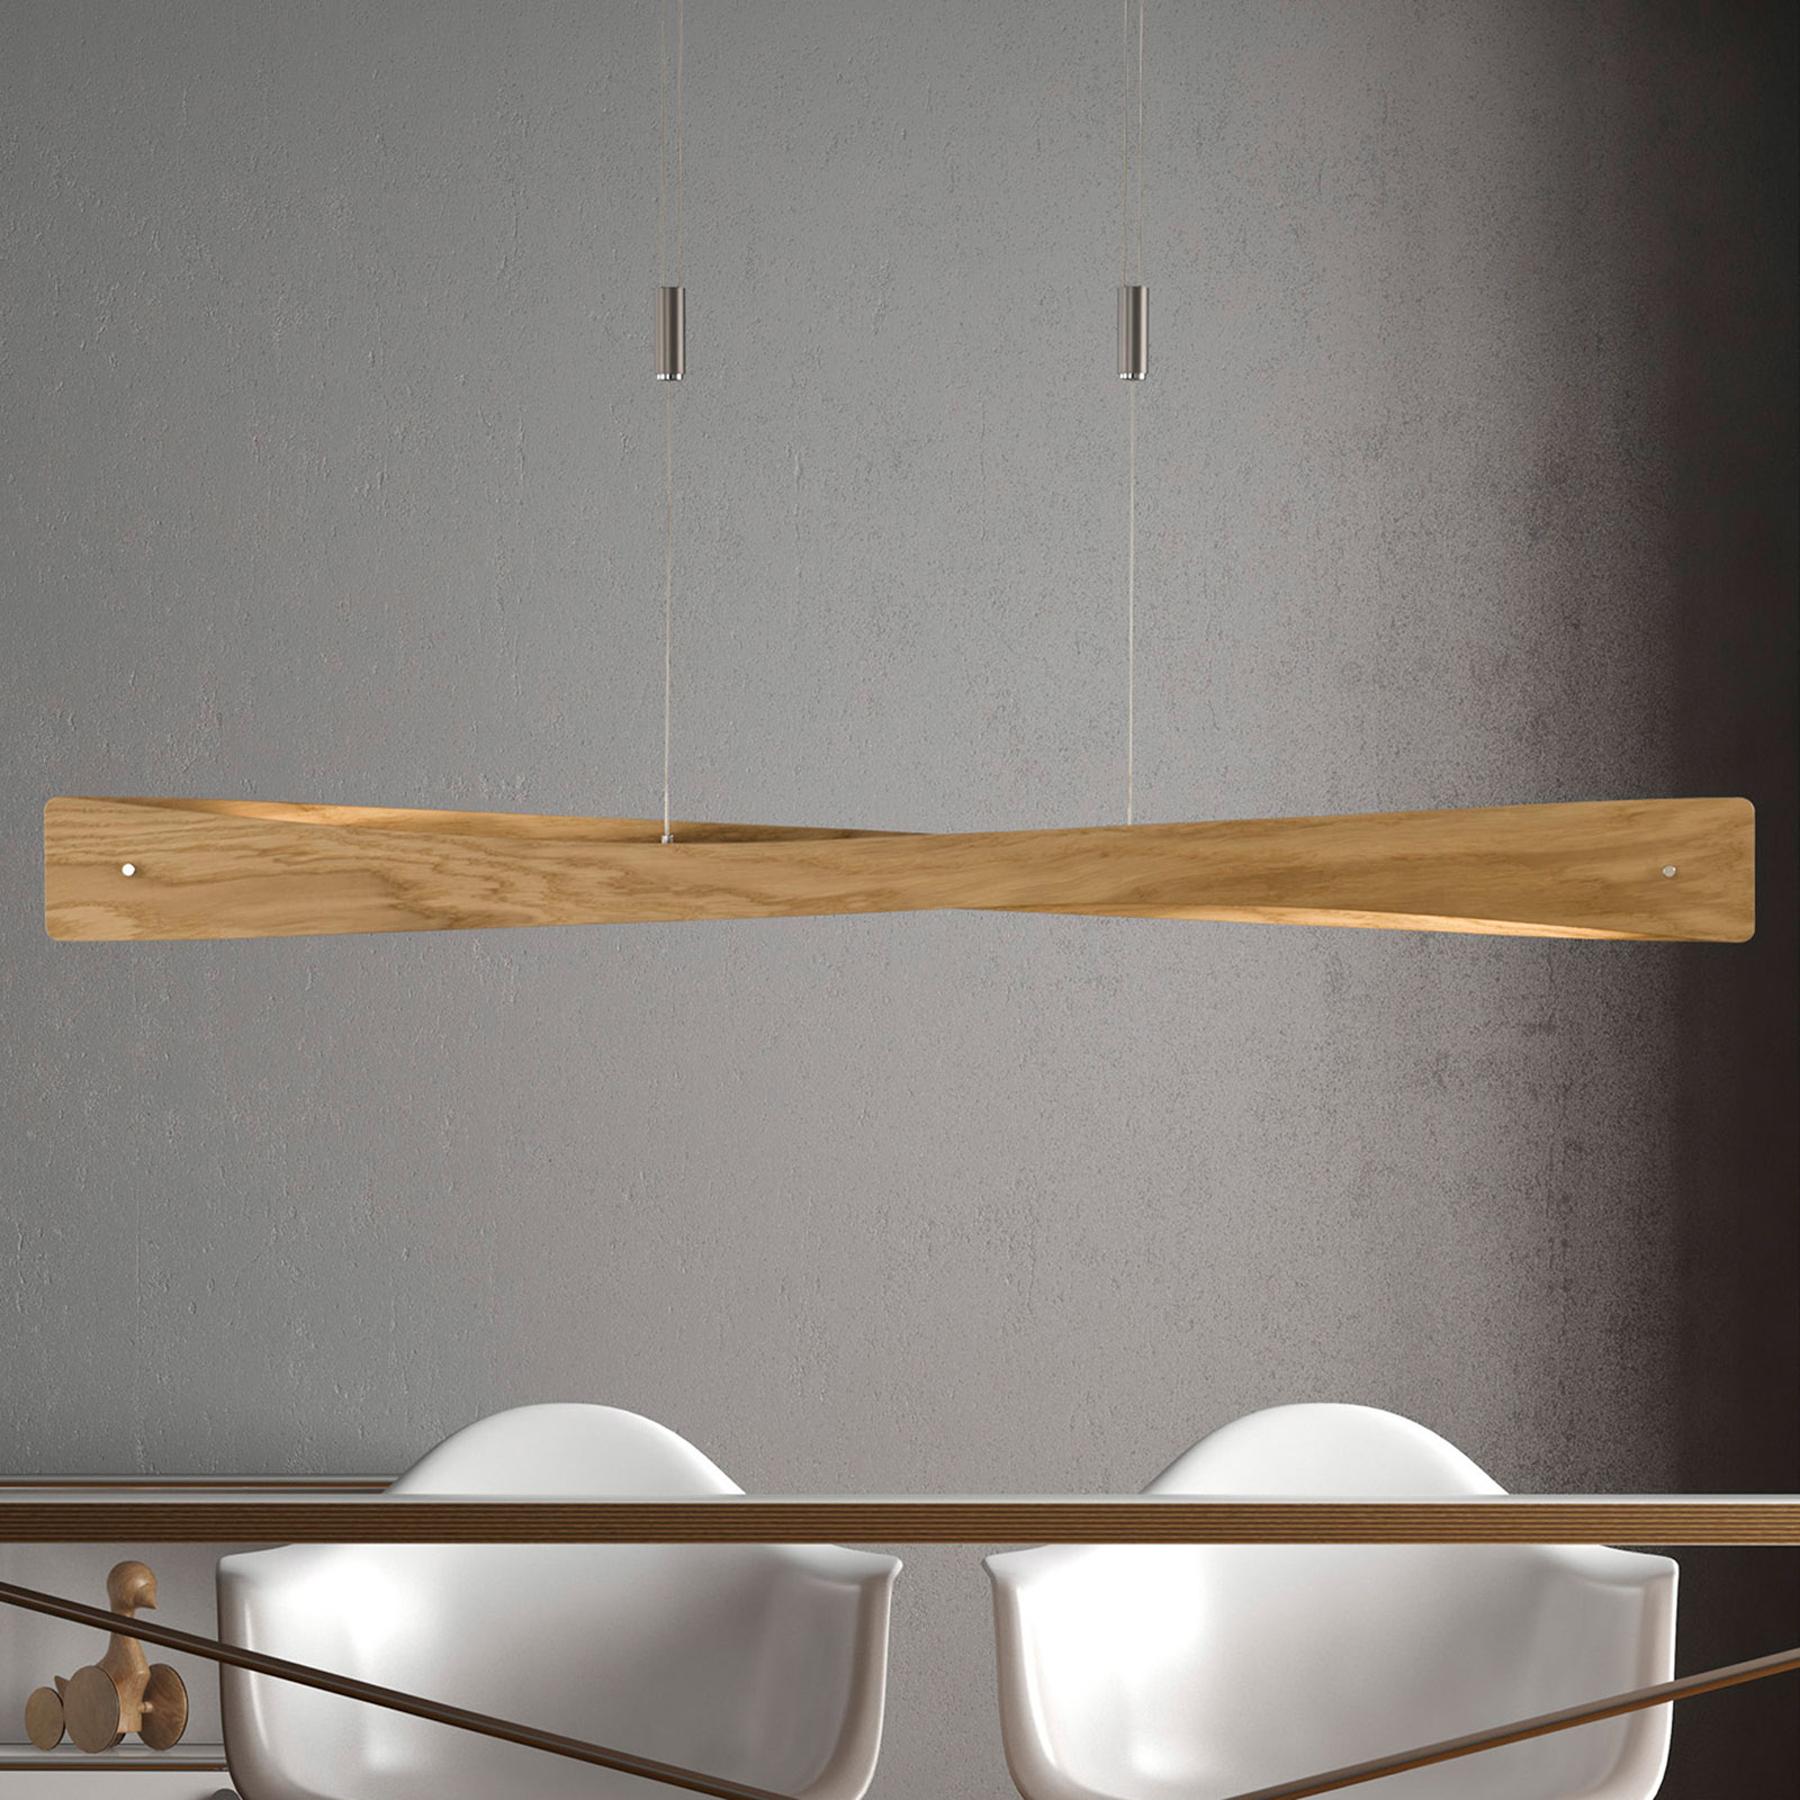 Lucande Lian lampa wisząca LED, drewno dębowe